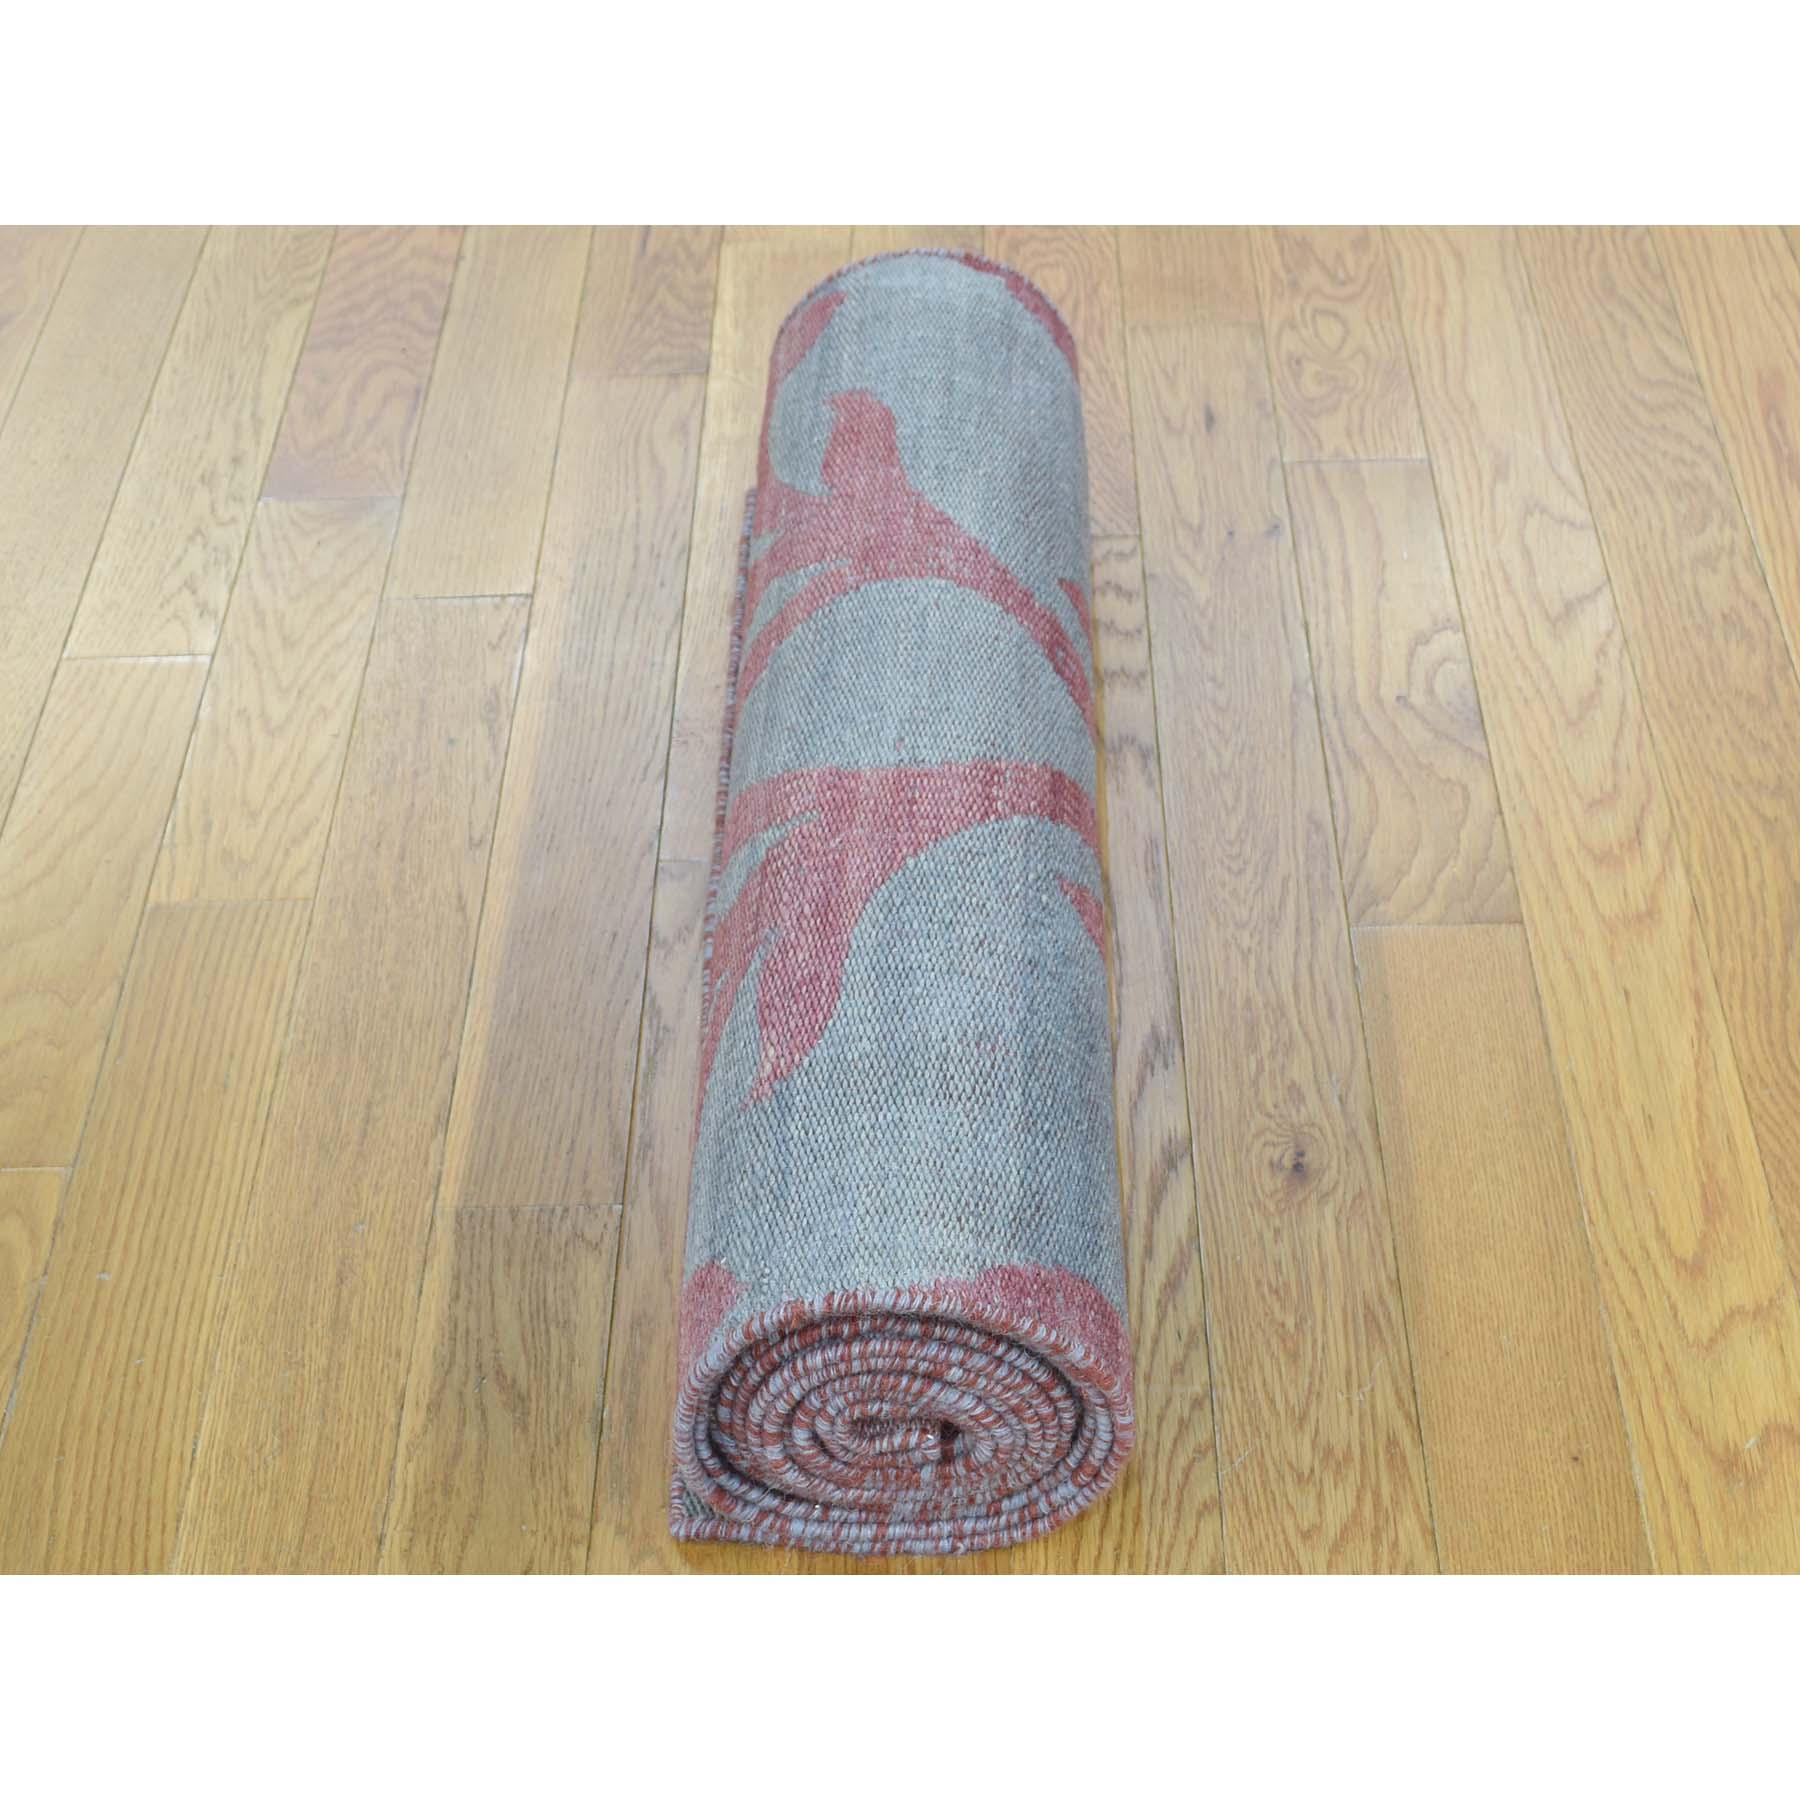 2-7 x8- Hand-Woven Durie Kilim Reversible Flat Weave Oriental Runner Rug